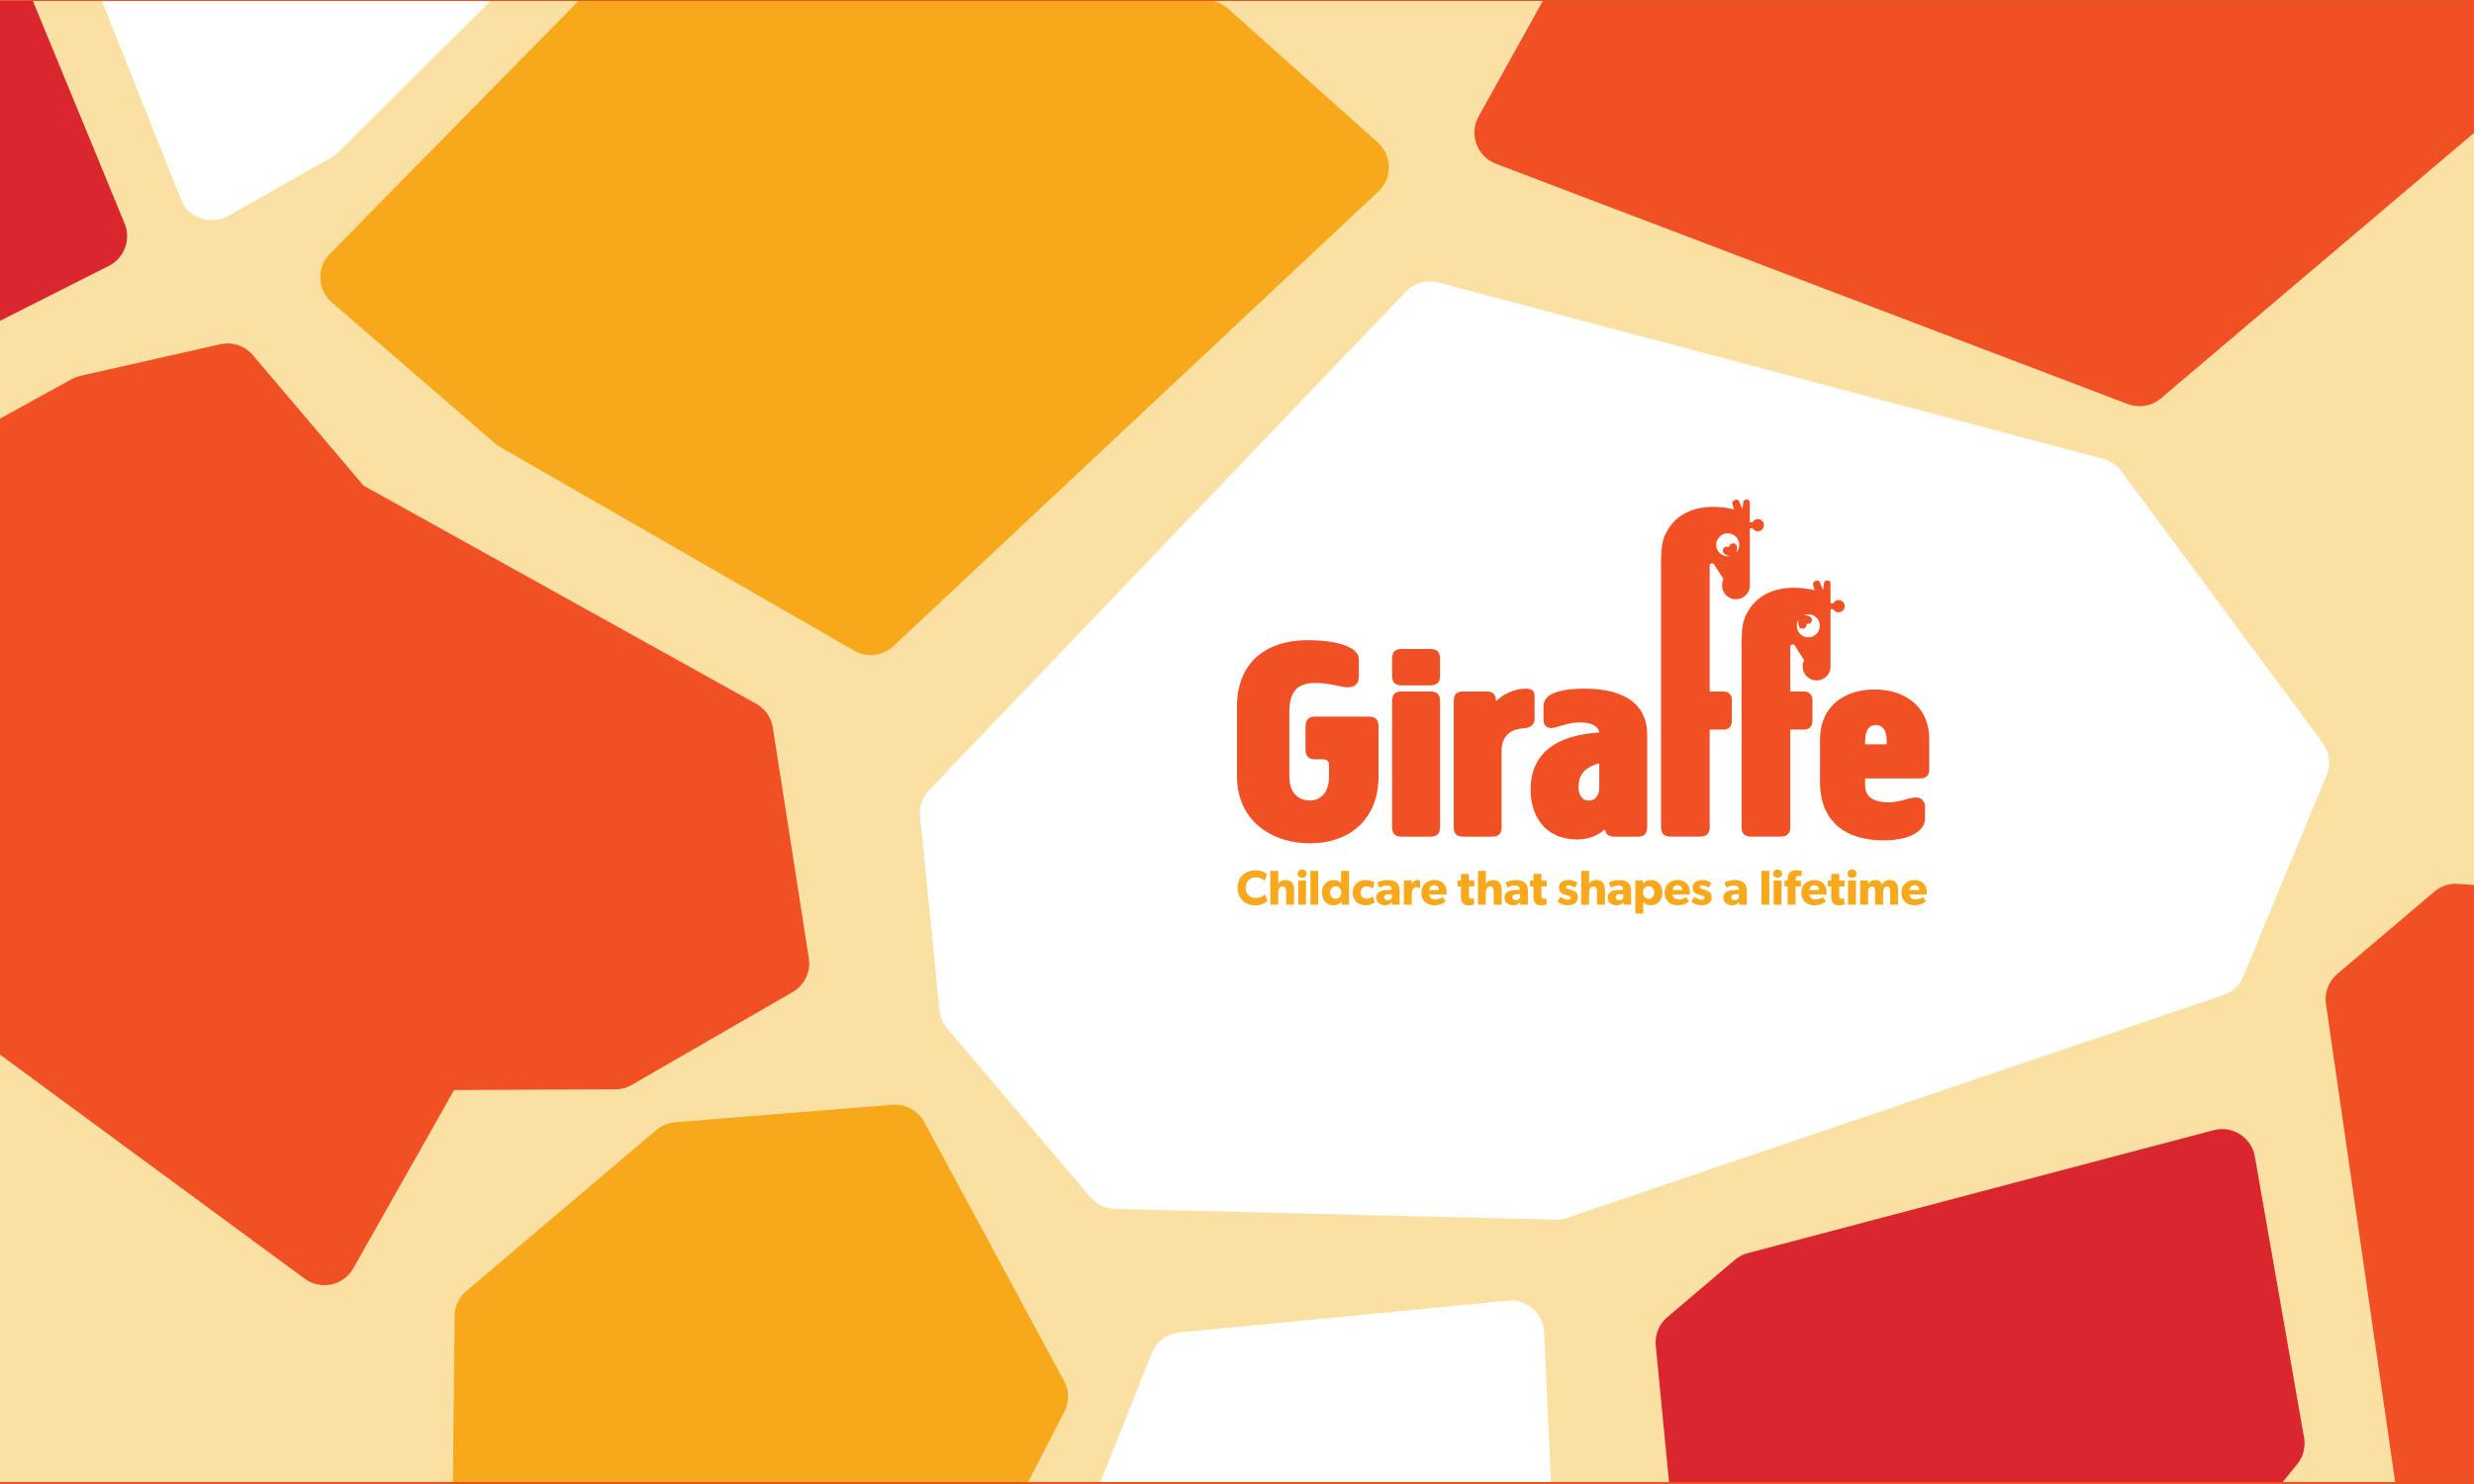 Cover image: Giraffe